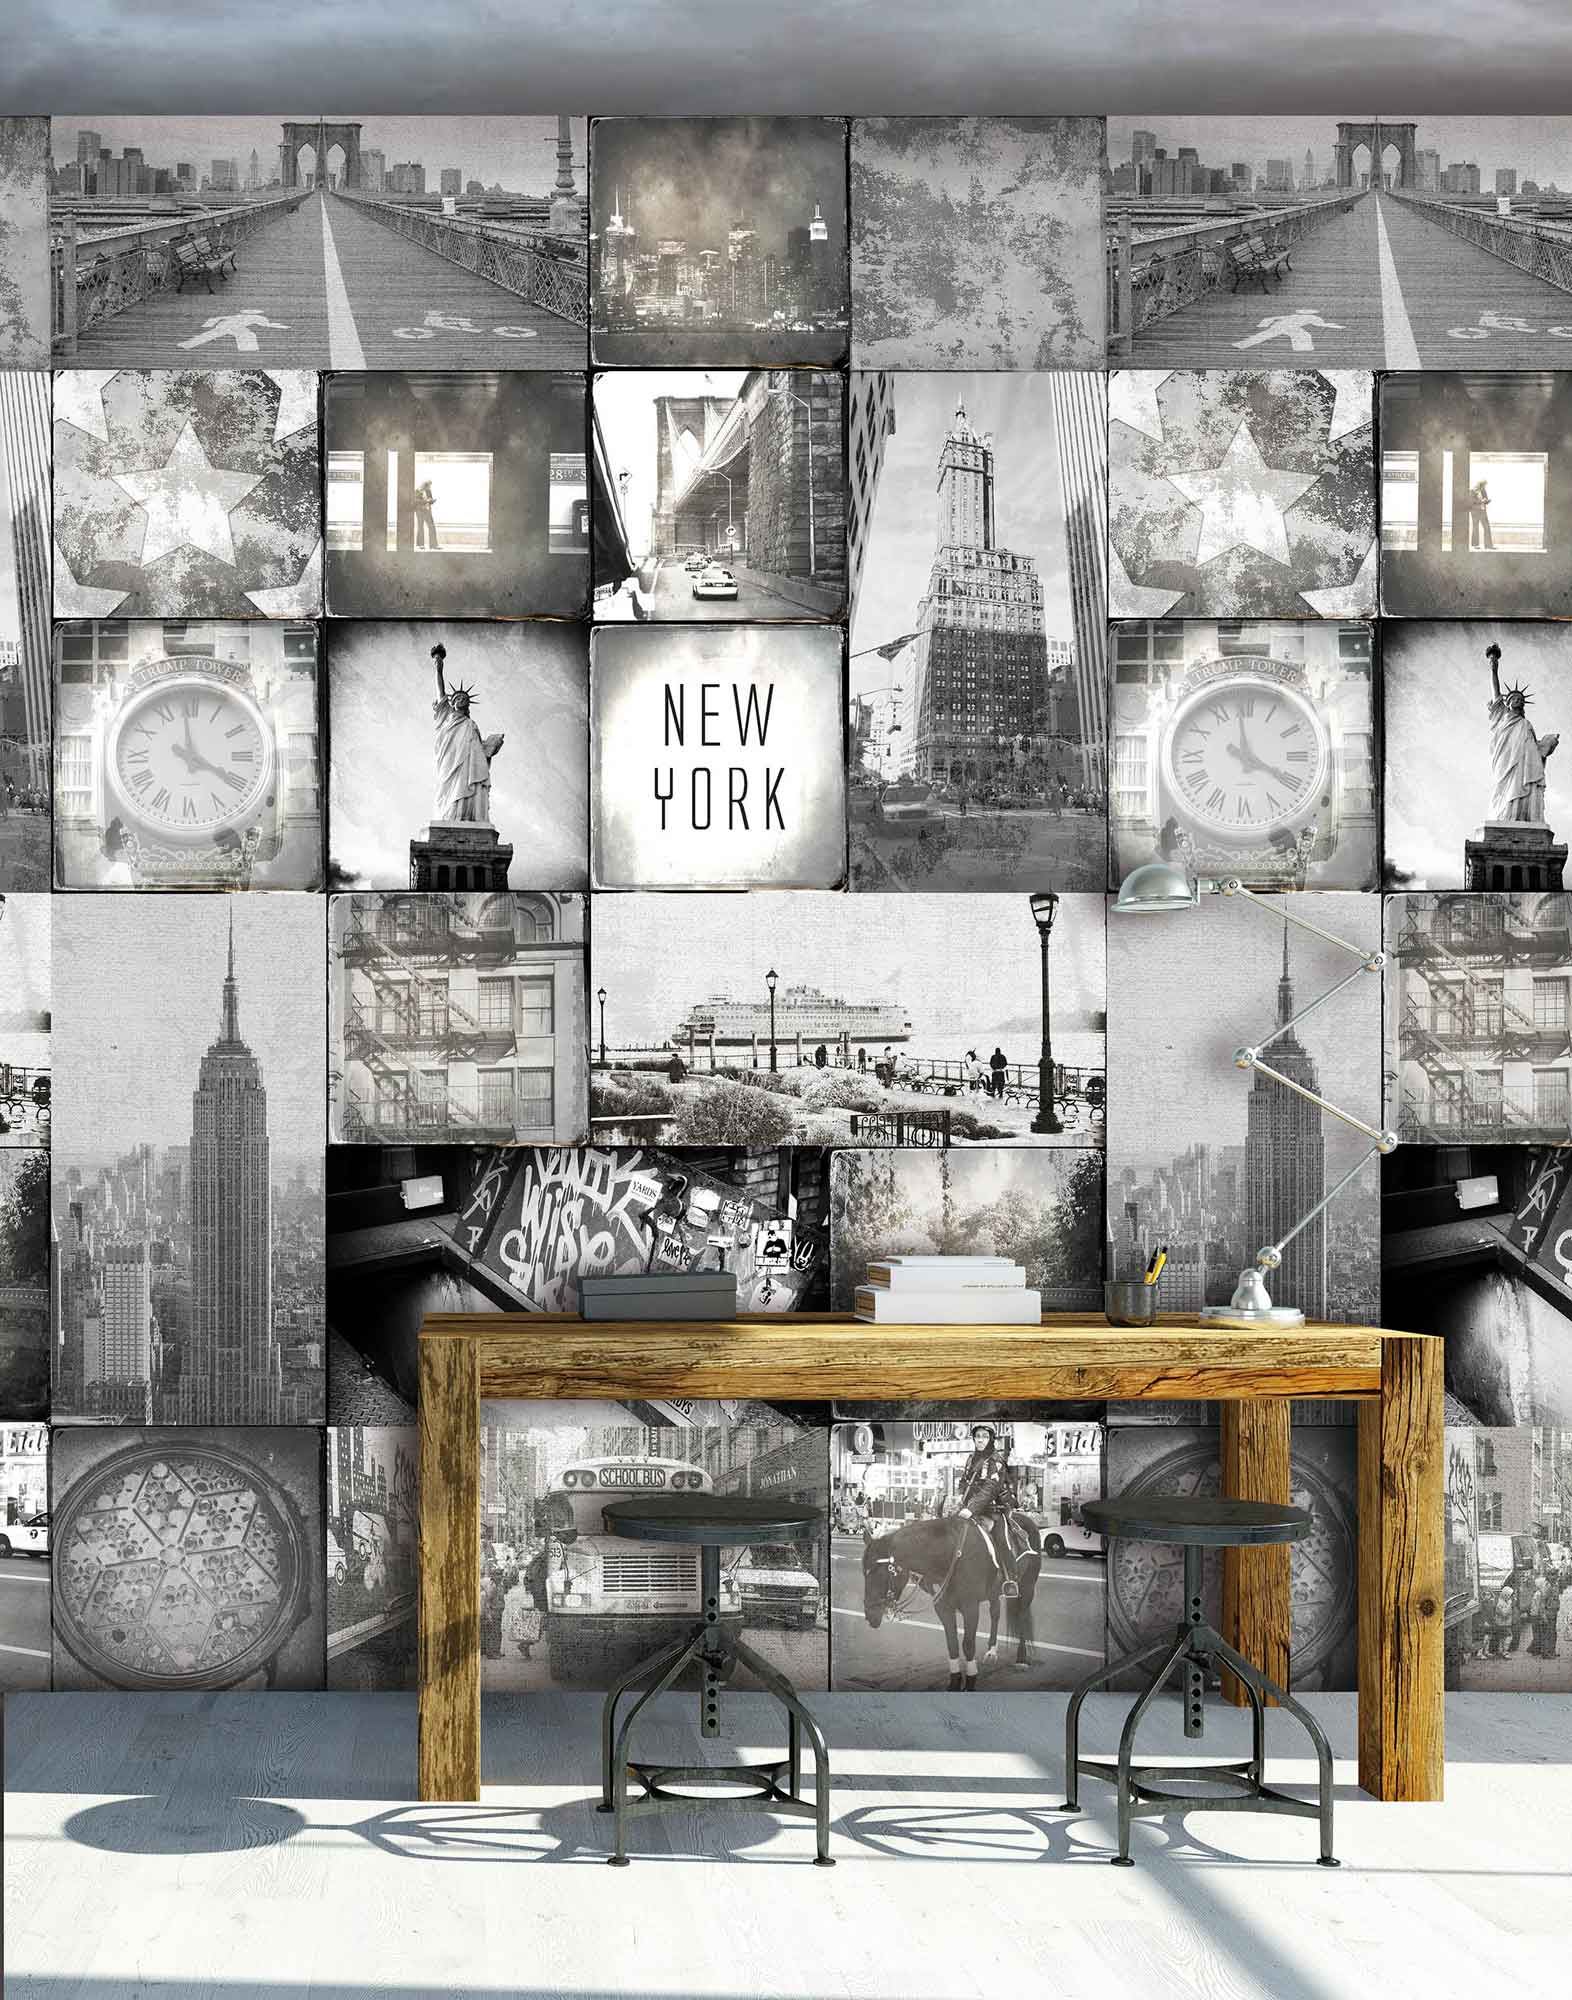 fototapete new york online kaufen. Black Bedroom Furniture Sets. Home Design Ideas